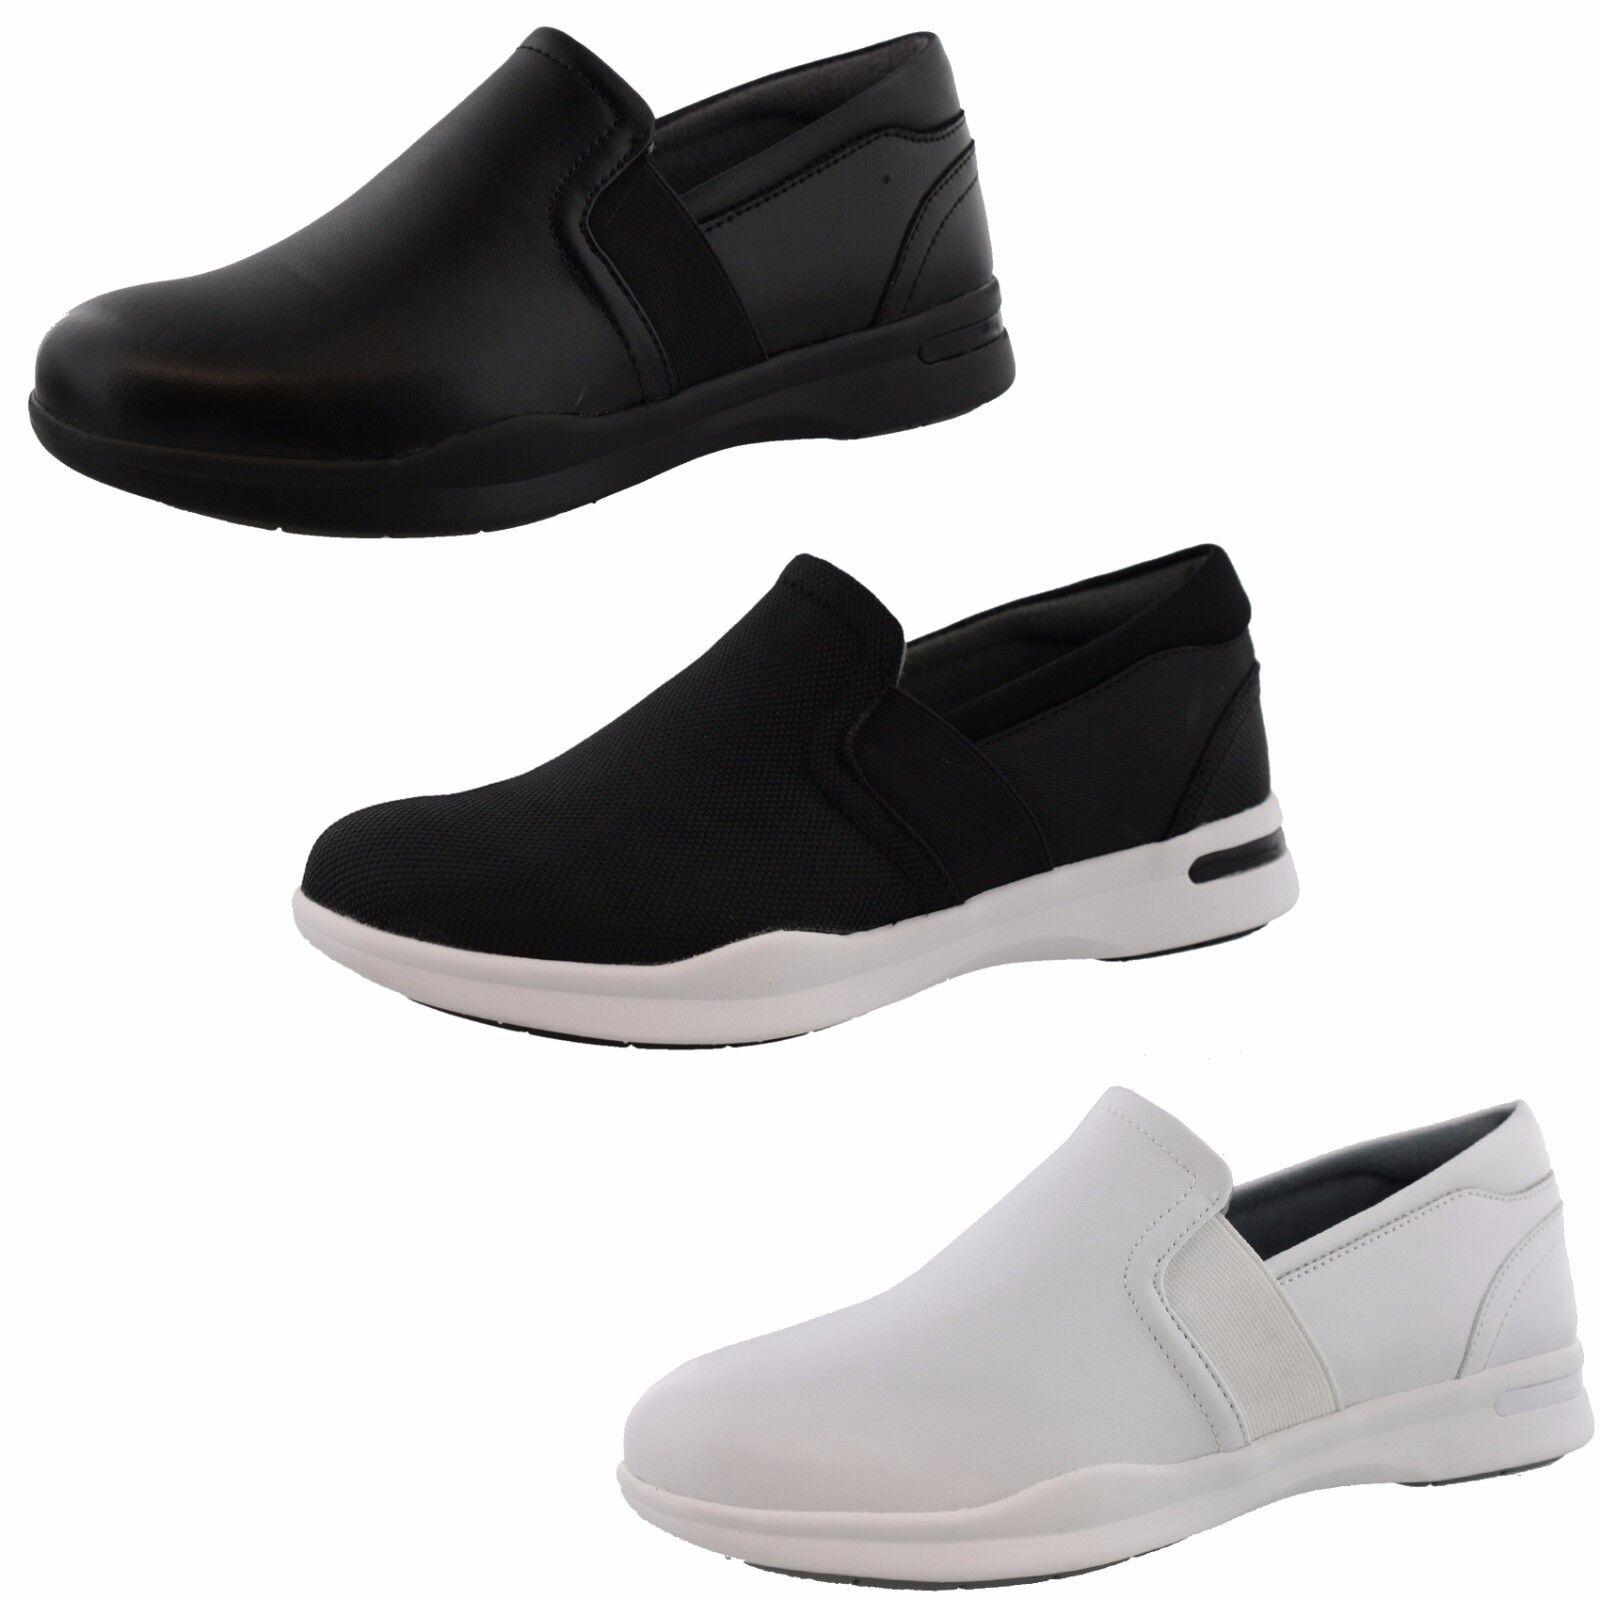 femmes SOFTWALK VANTAGE SLIP RESISTANT SLIP ON Chaussures